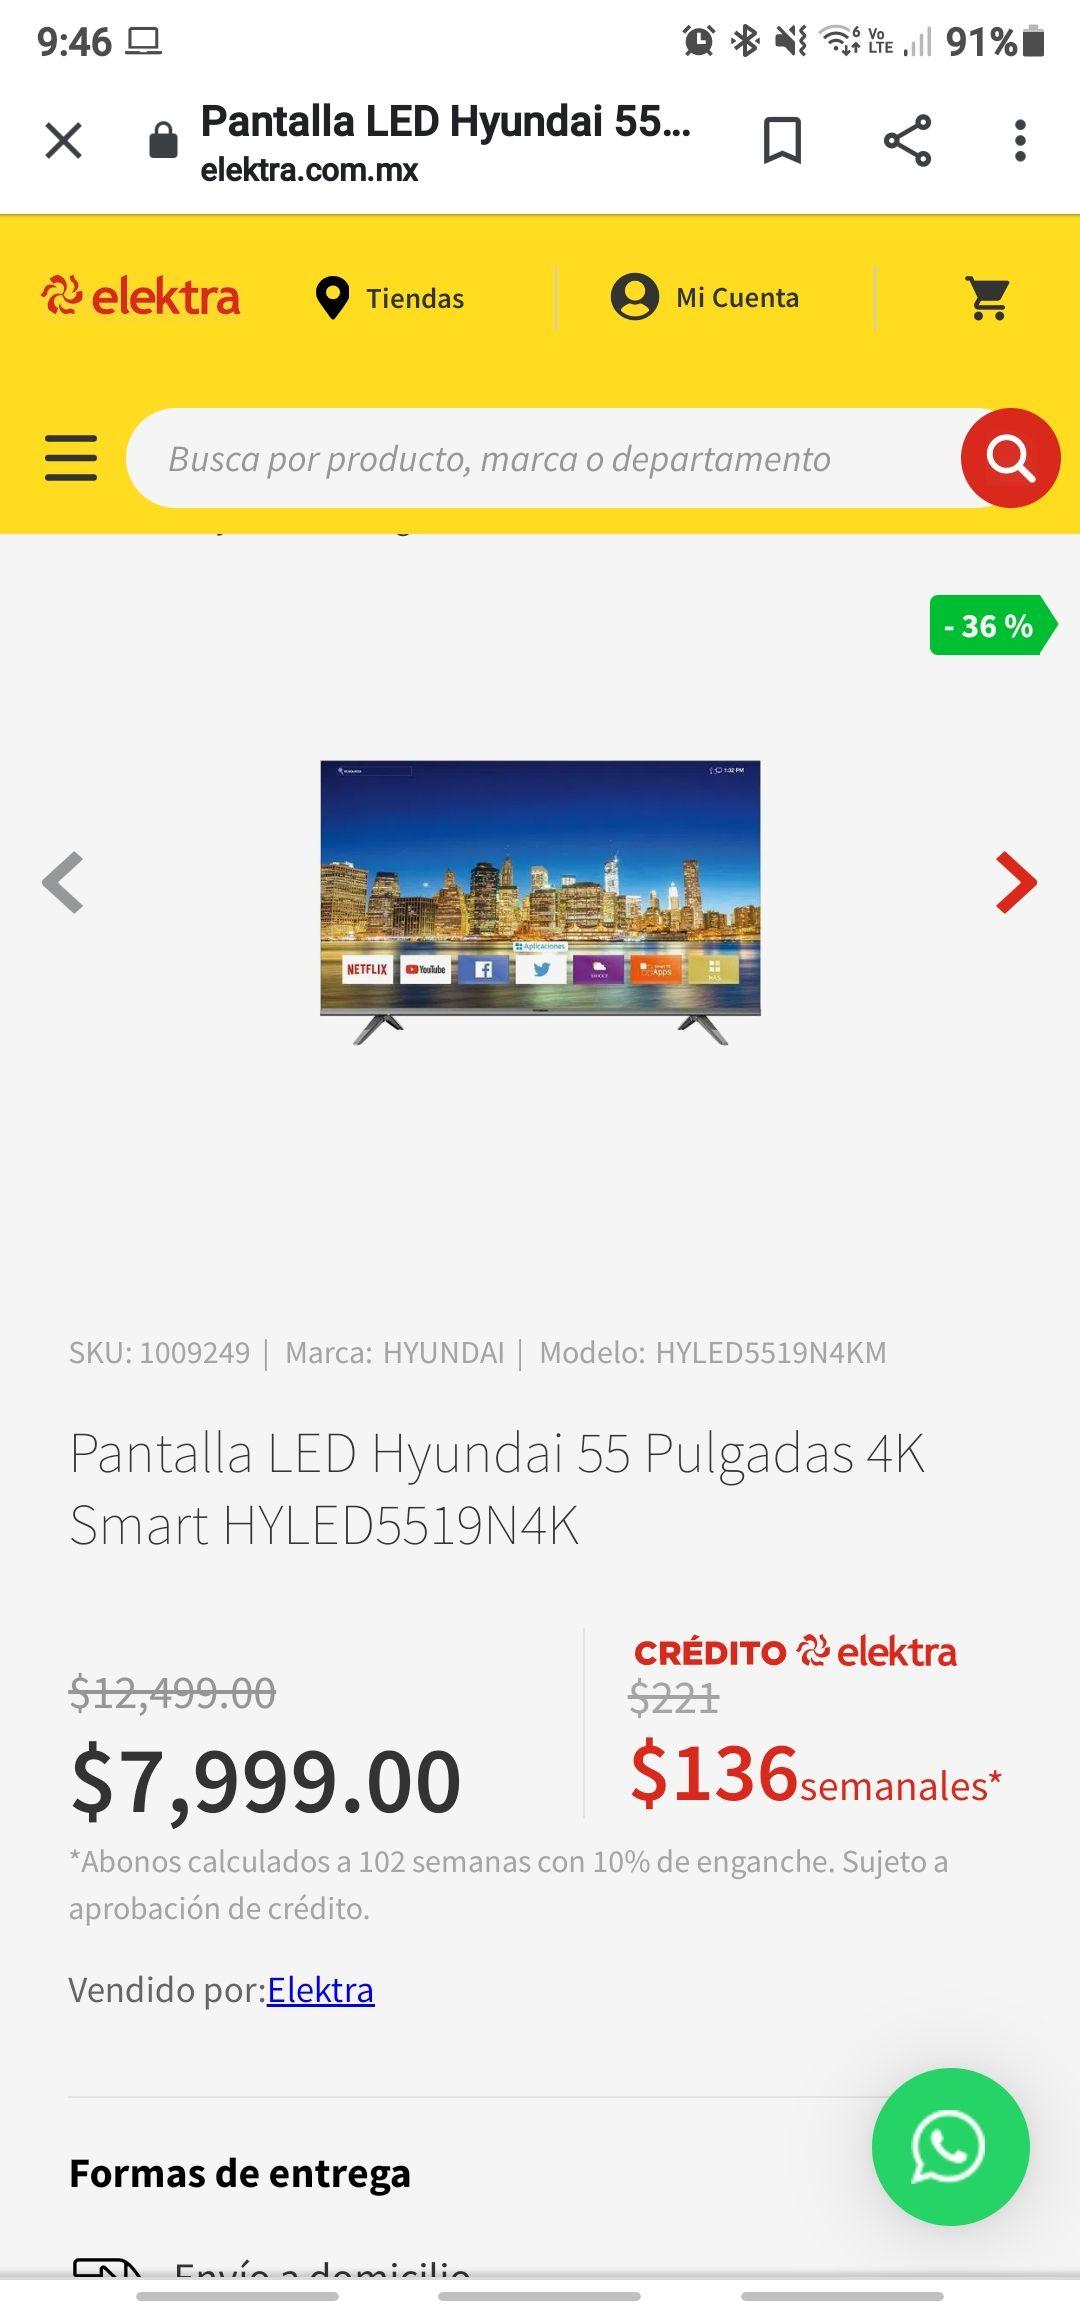 "Elektra pantalla Led Hyundai 55"" 4K smart"